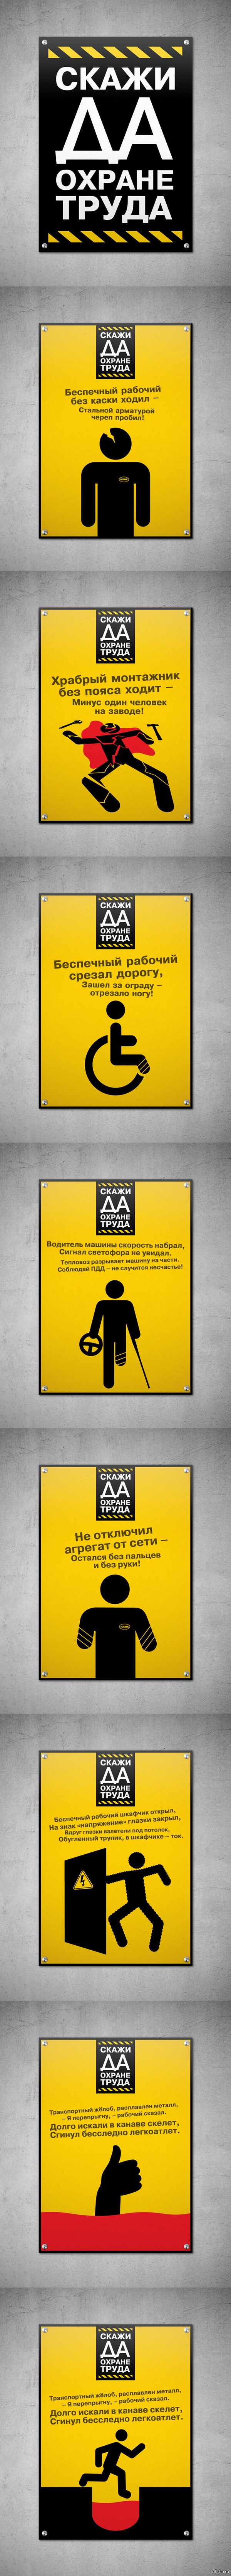 Серия плакатов Скажи ДА охране труда